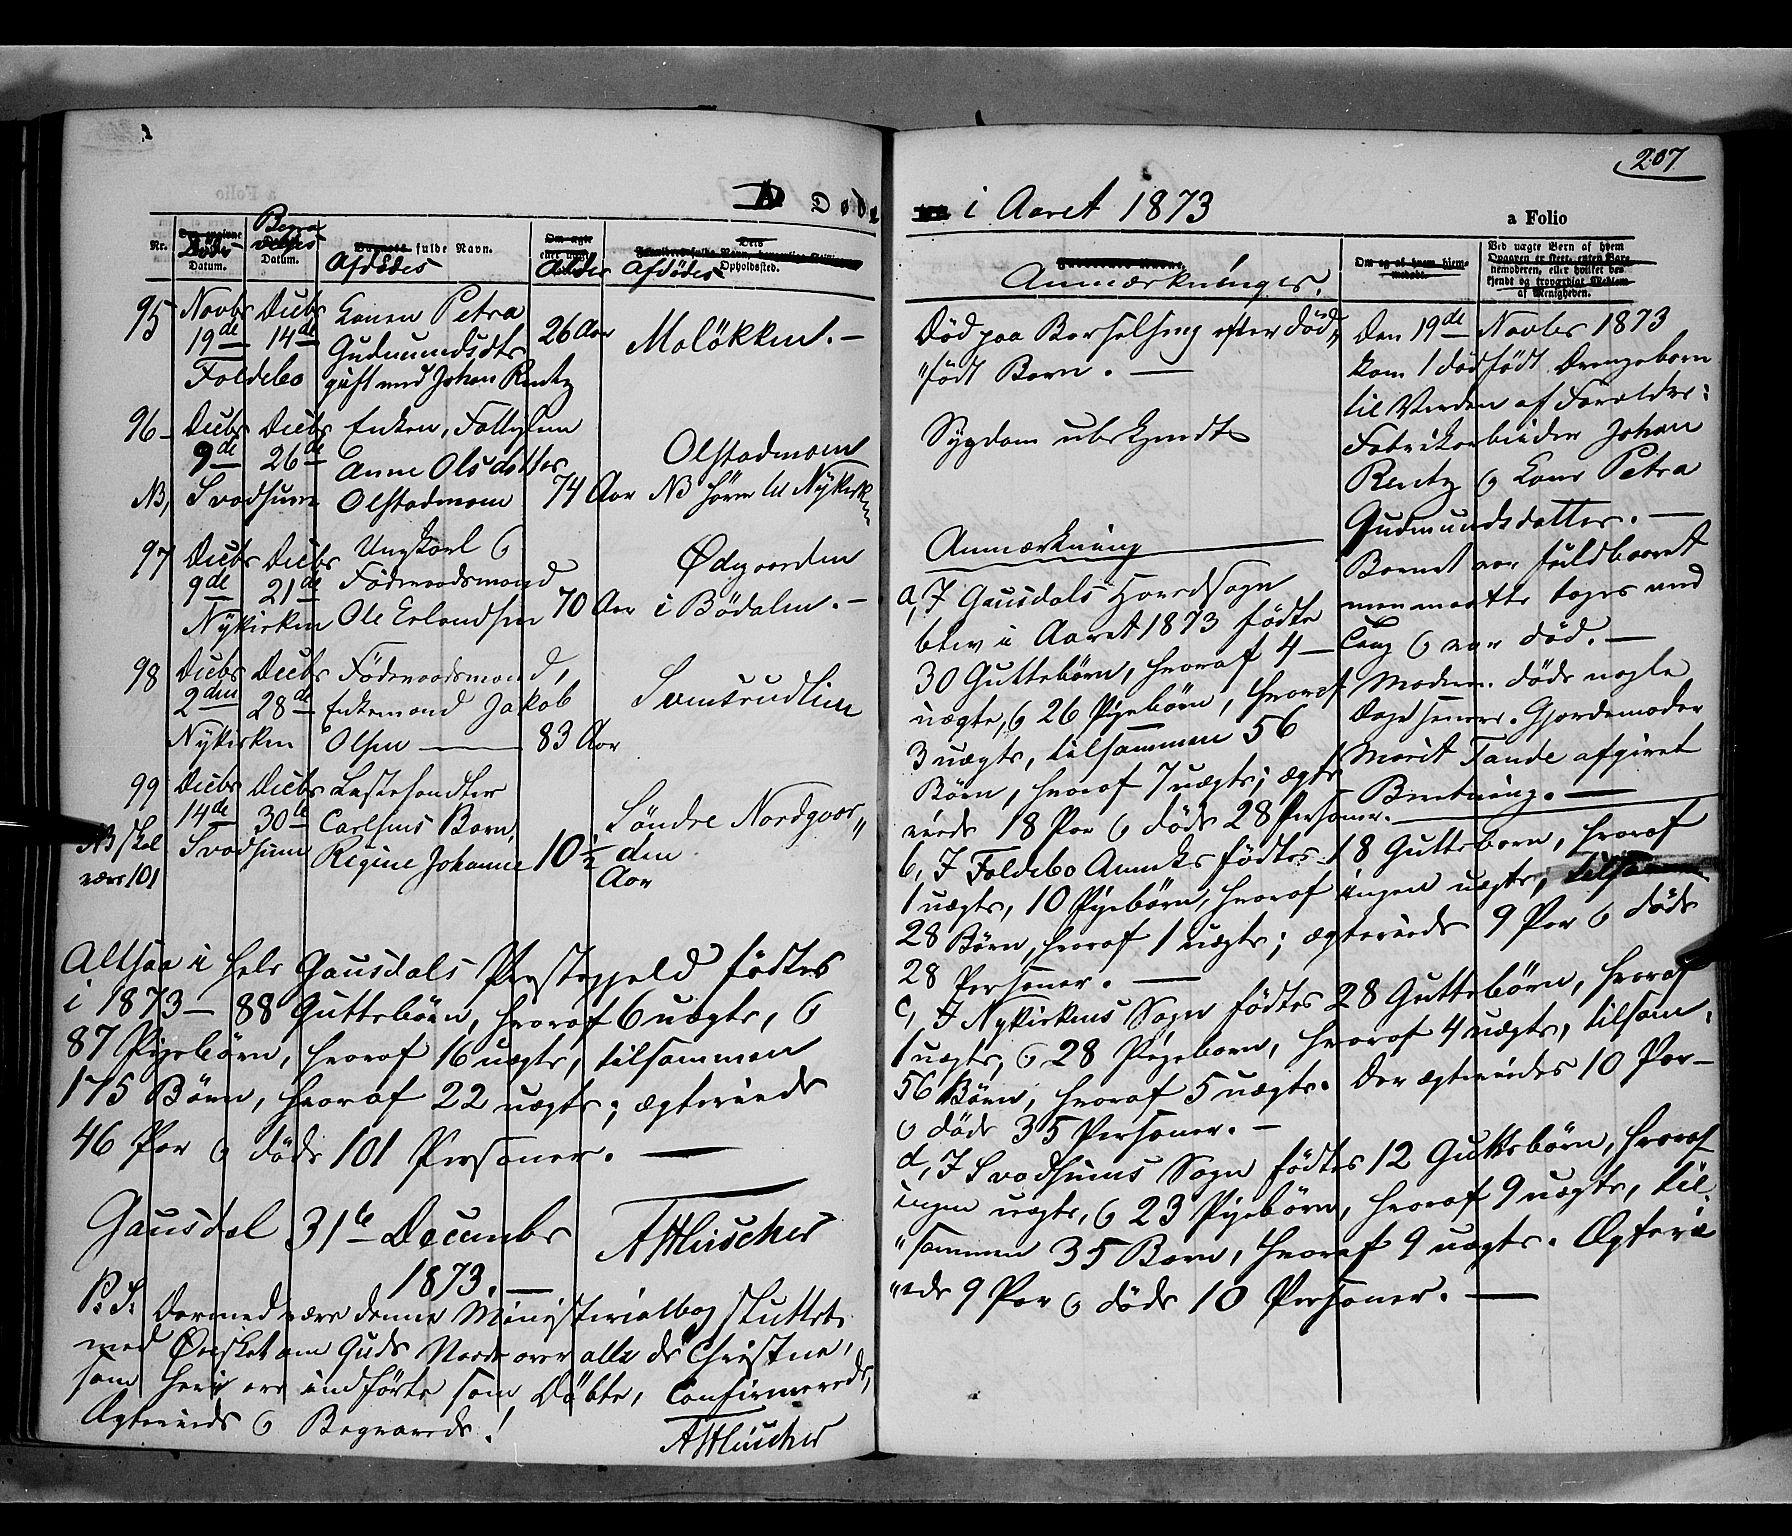 SAH, Gausdal prestekontor, Ministerialbok nr. 9, 1862-1873, s. 207